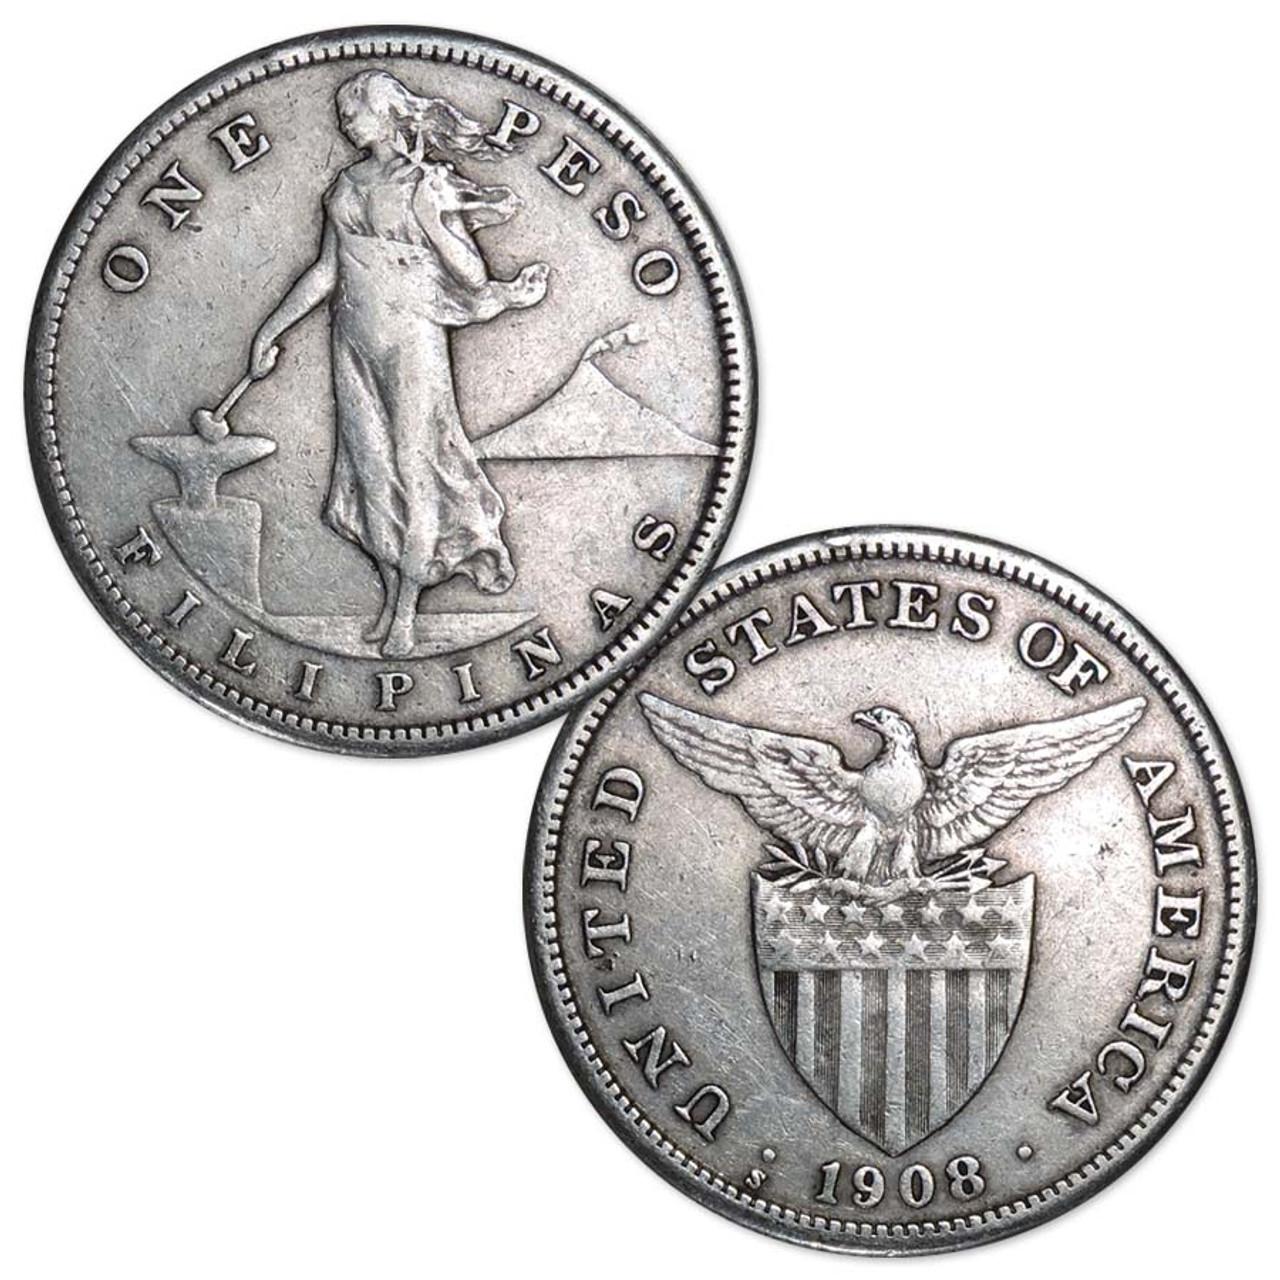 American Philippines 1907-1912 Liberty Silver Peso Very Fine Image 1